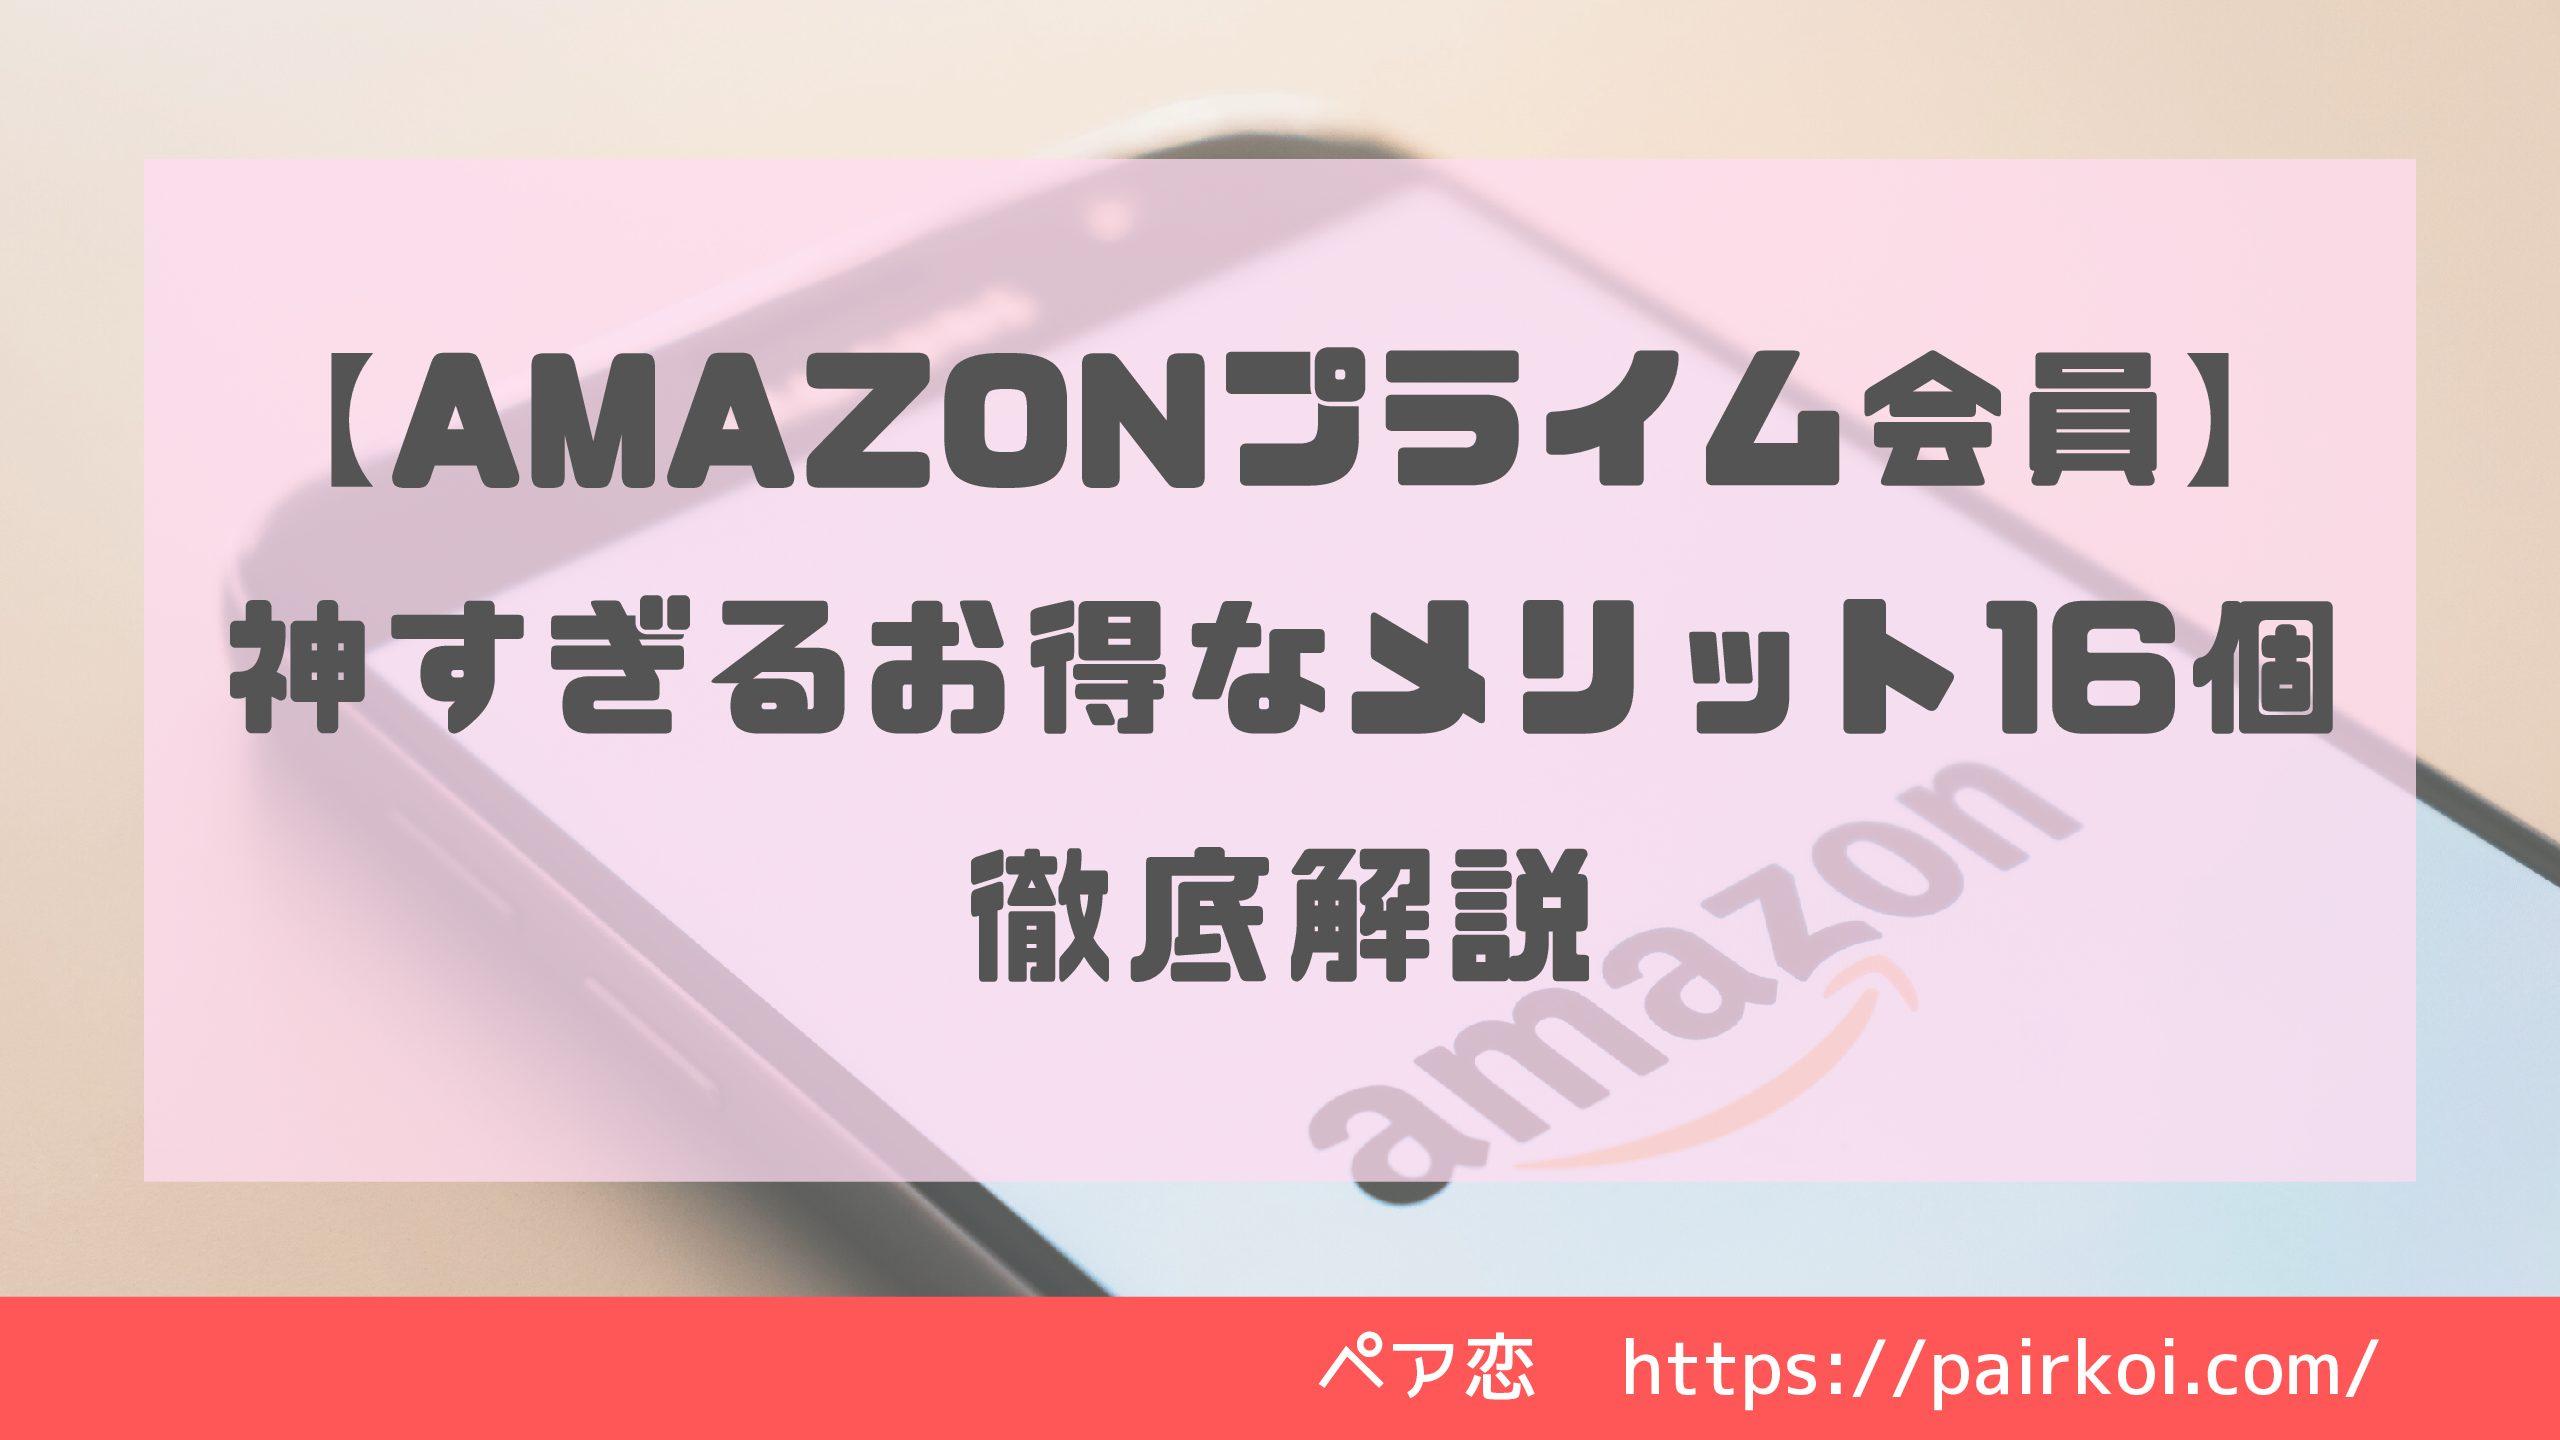 【Amazonプライム会員】神すぎるお得なメリット16個徹底解説